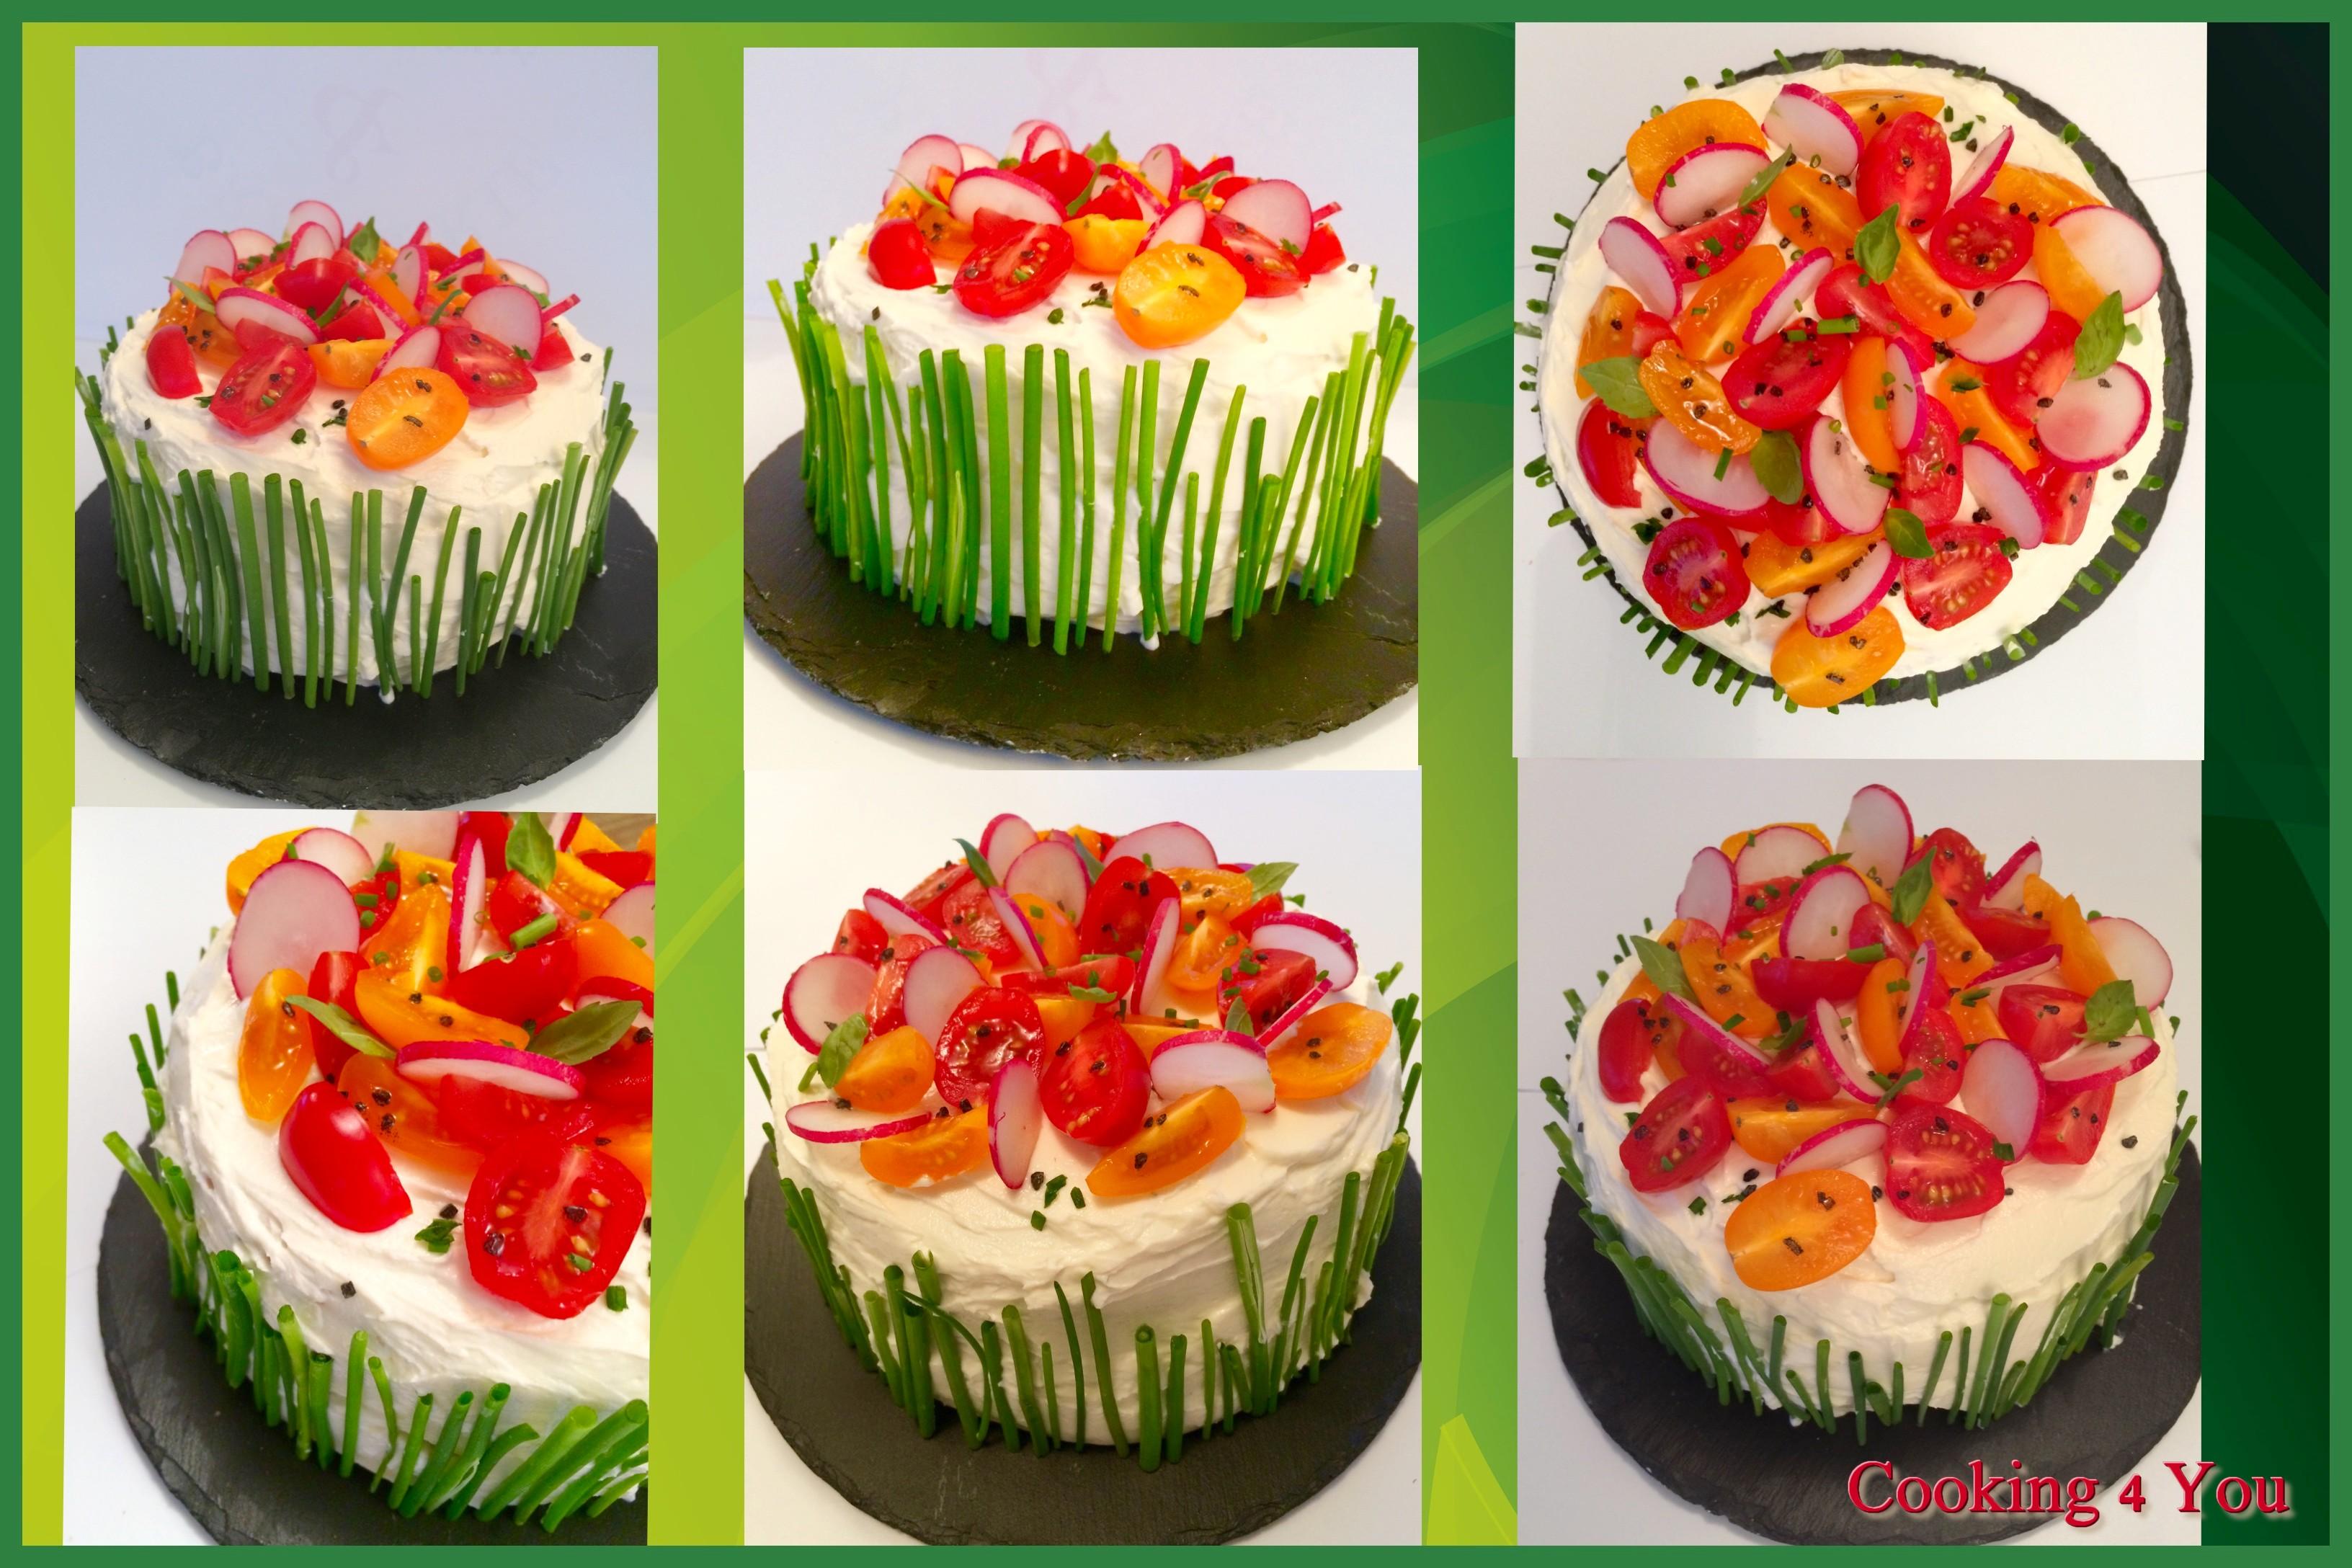 Recettes Cake Sale Vegetarien